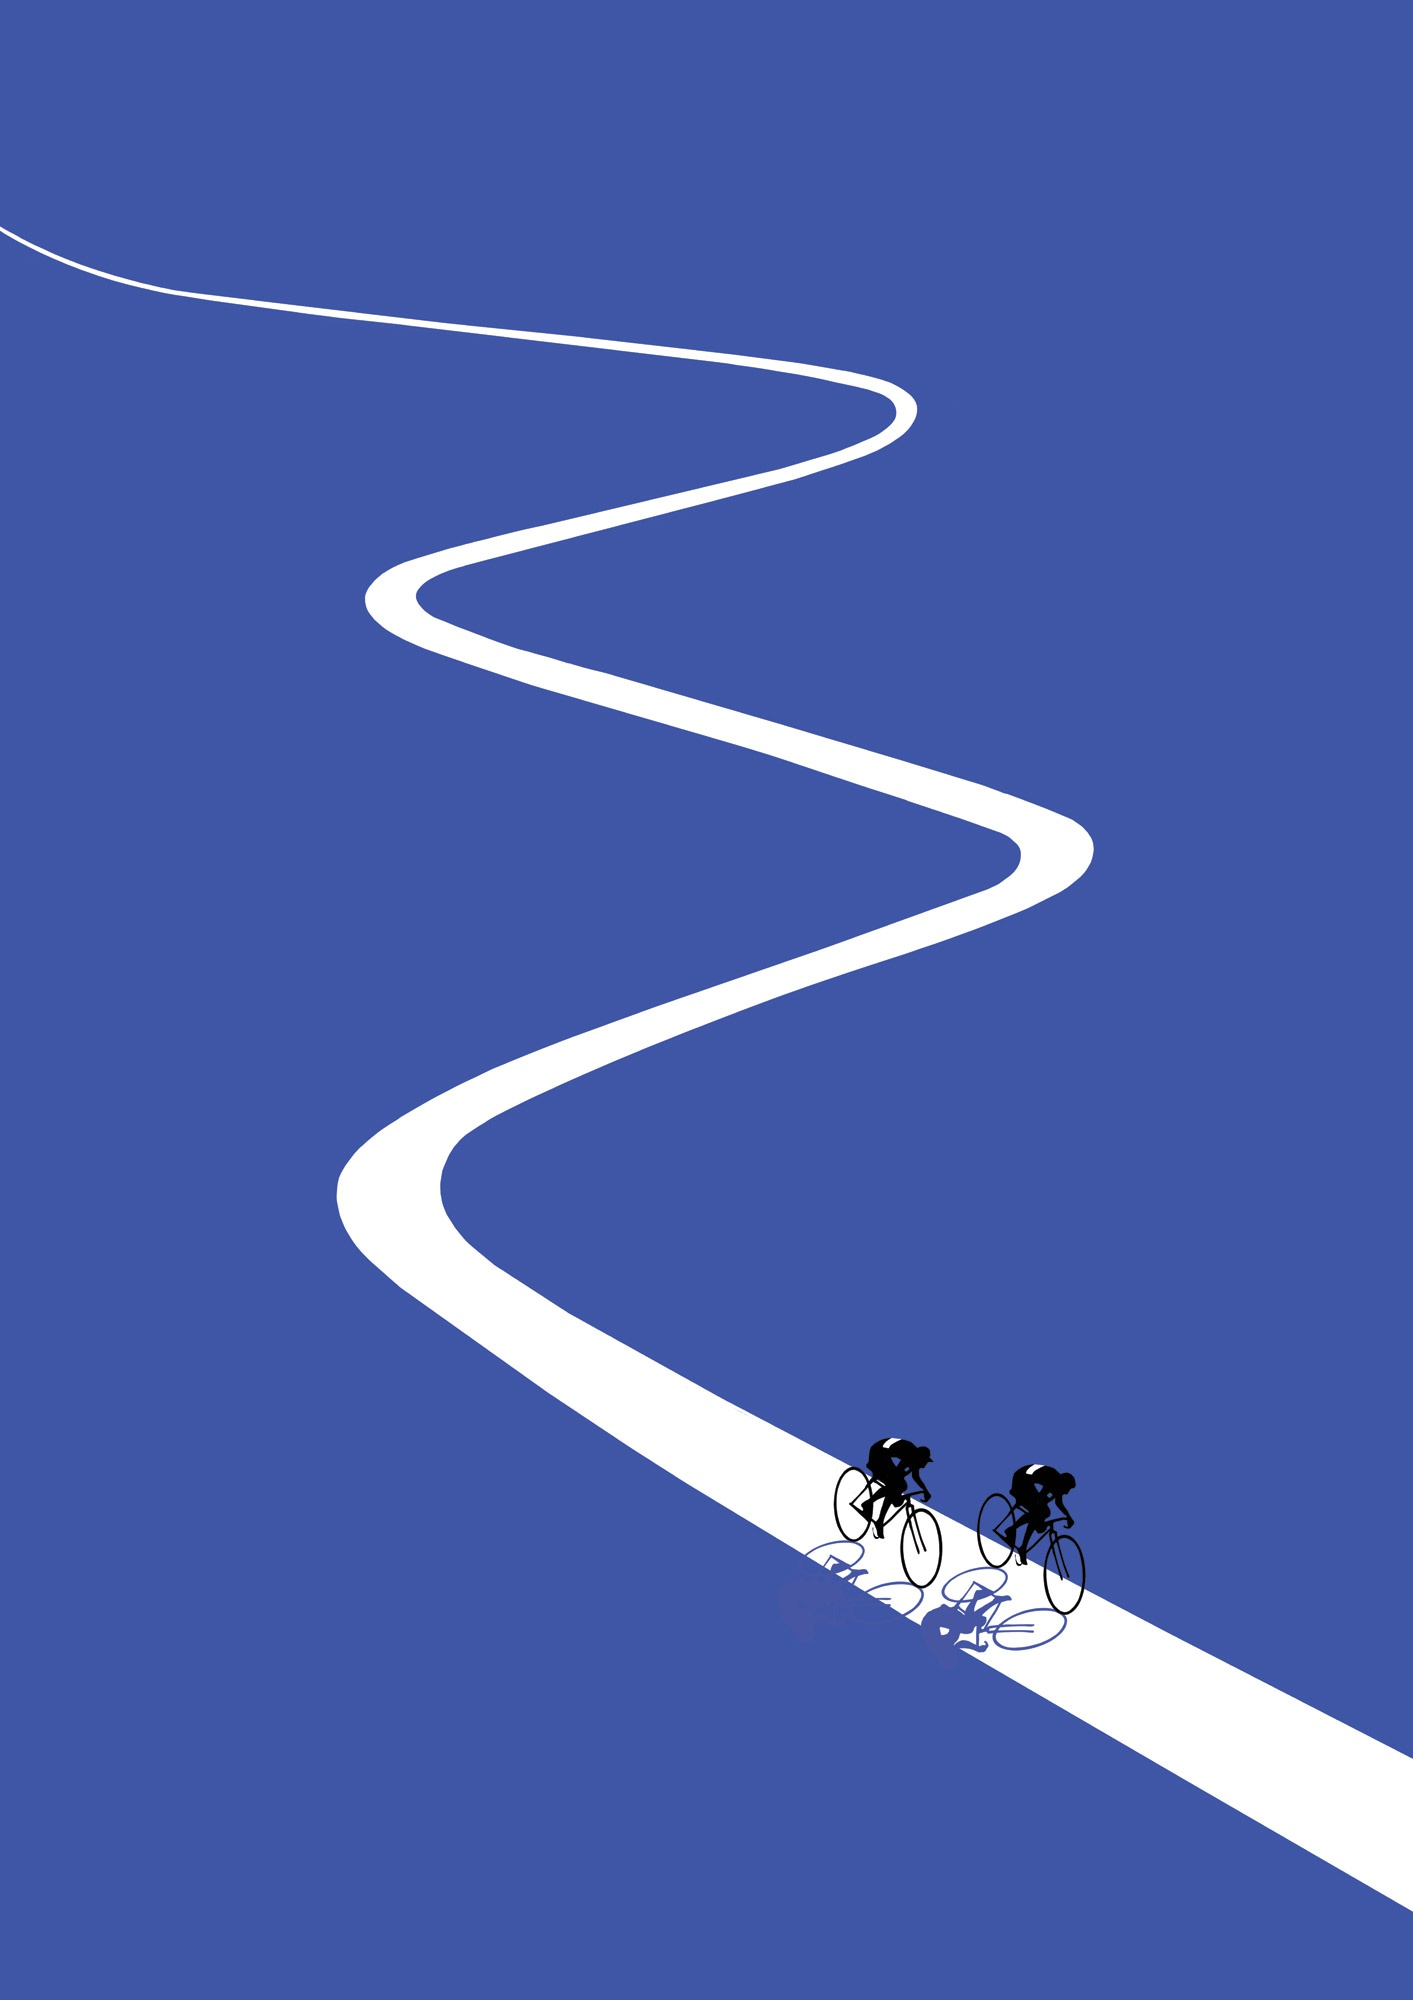 Jason brooks folio illustration sports cycling open road